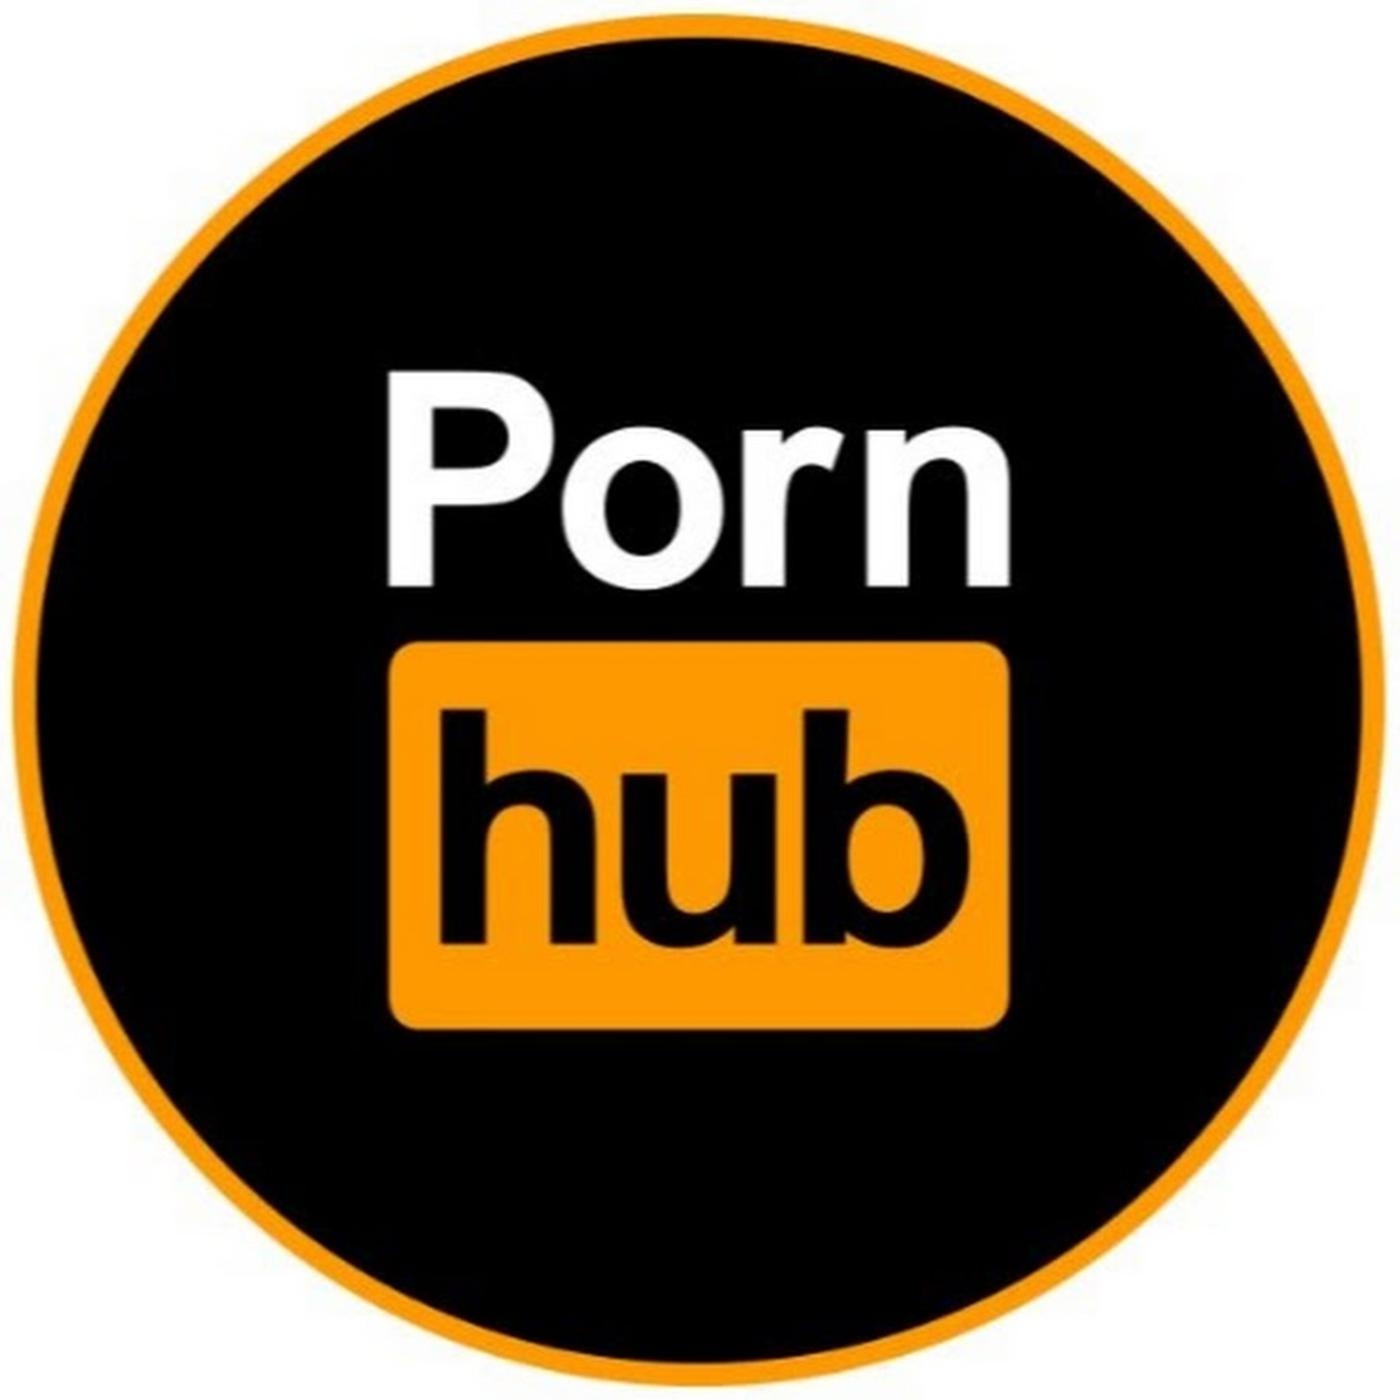 Casting Bed Pornography Hub